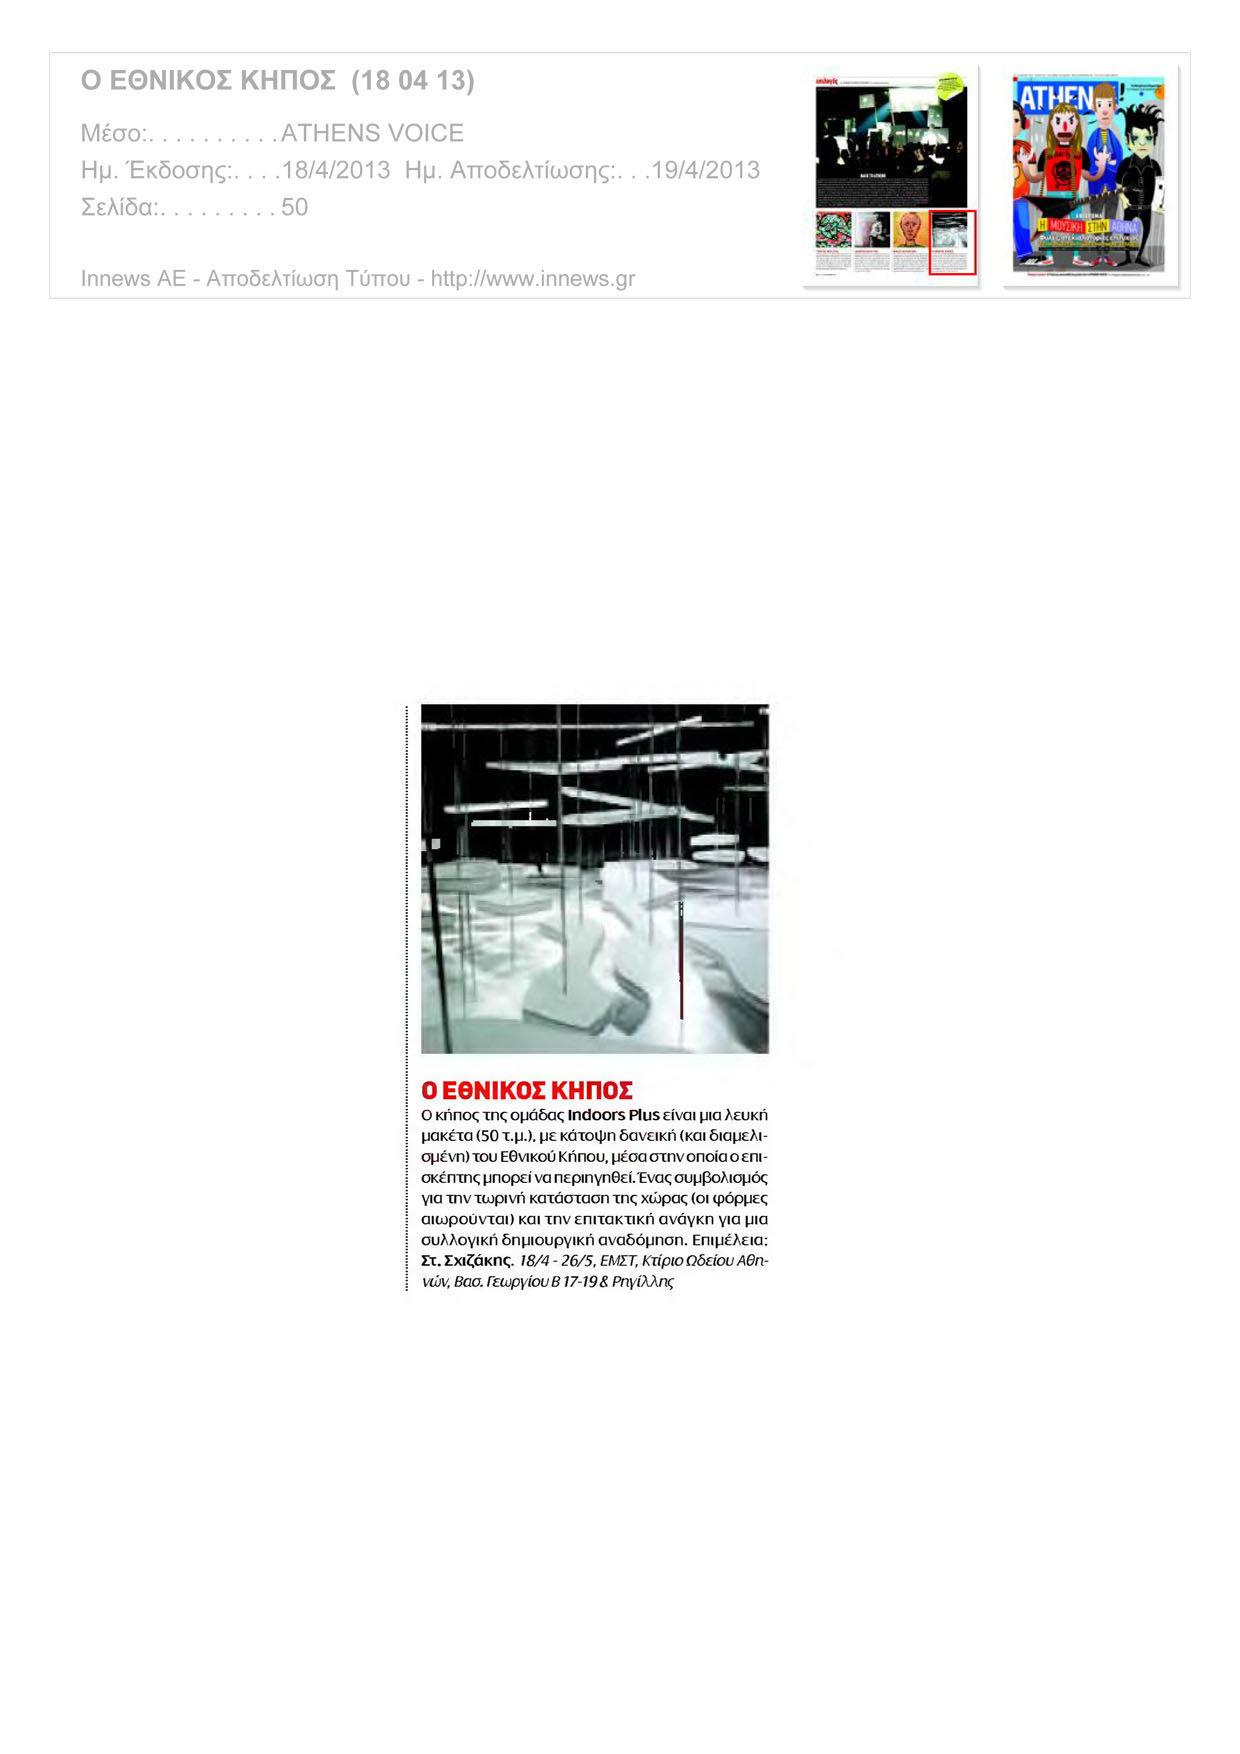 Athens Voice 18-4-2013 copy.jpg